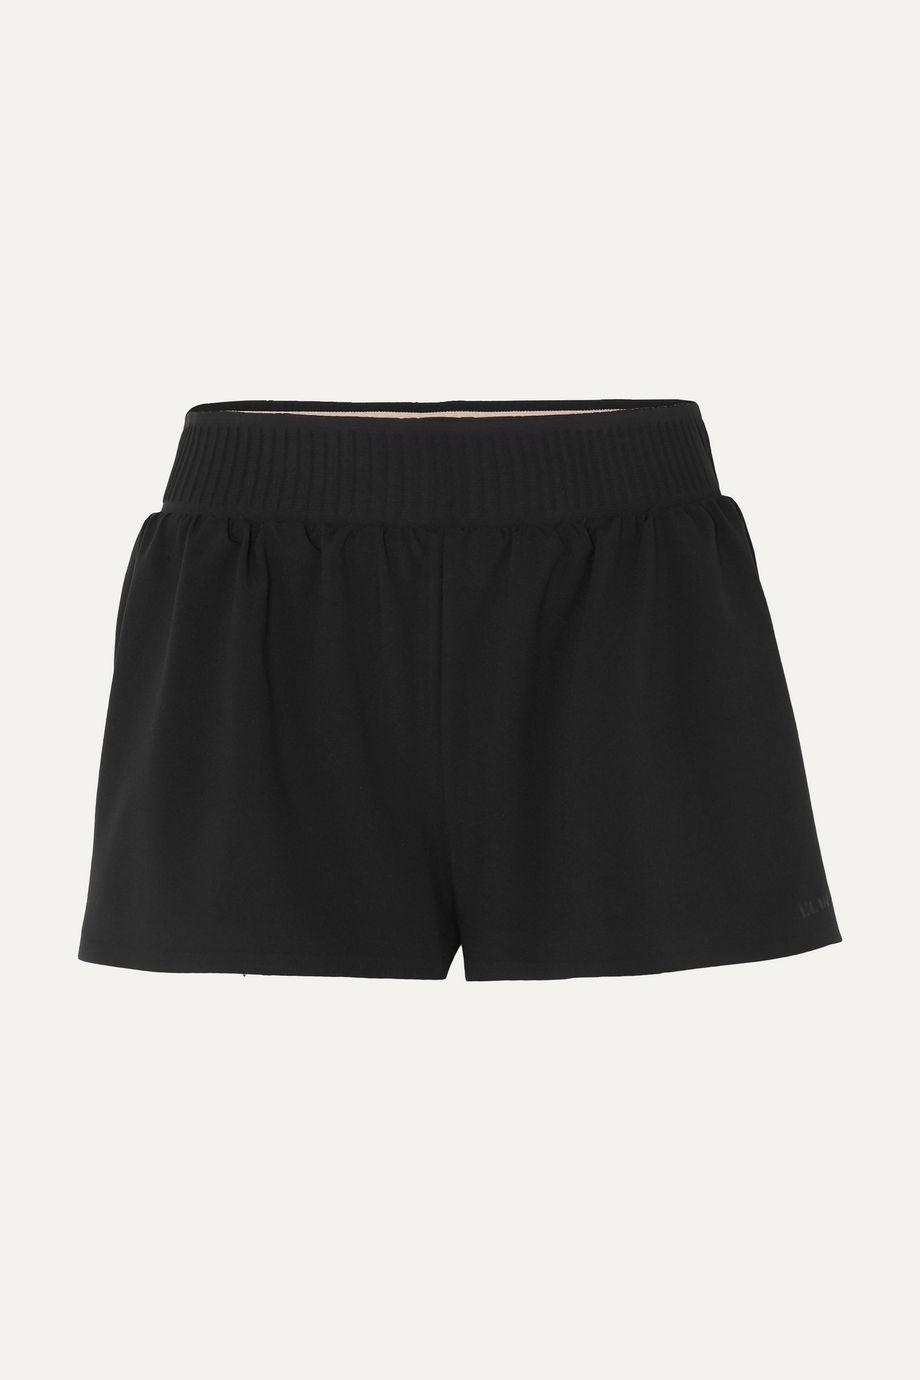 Vaara Stella stretch shorts